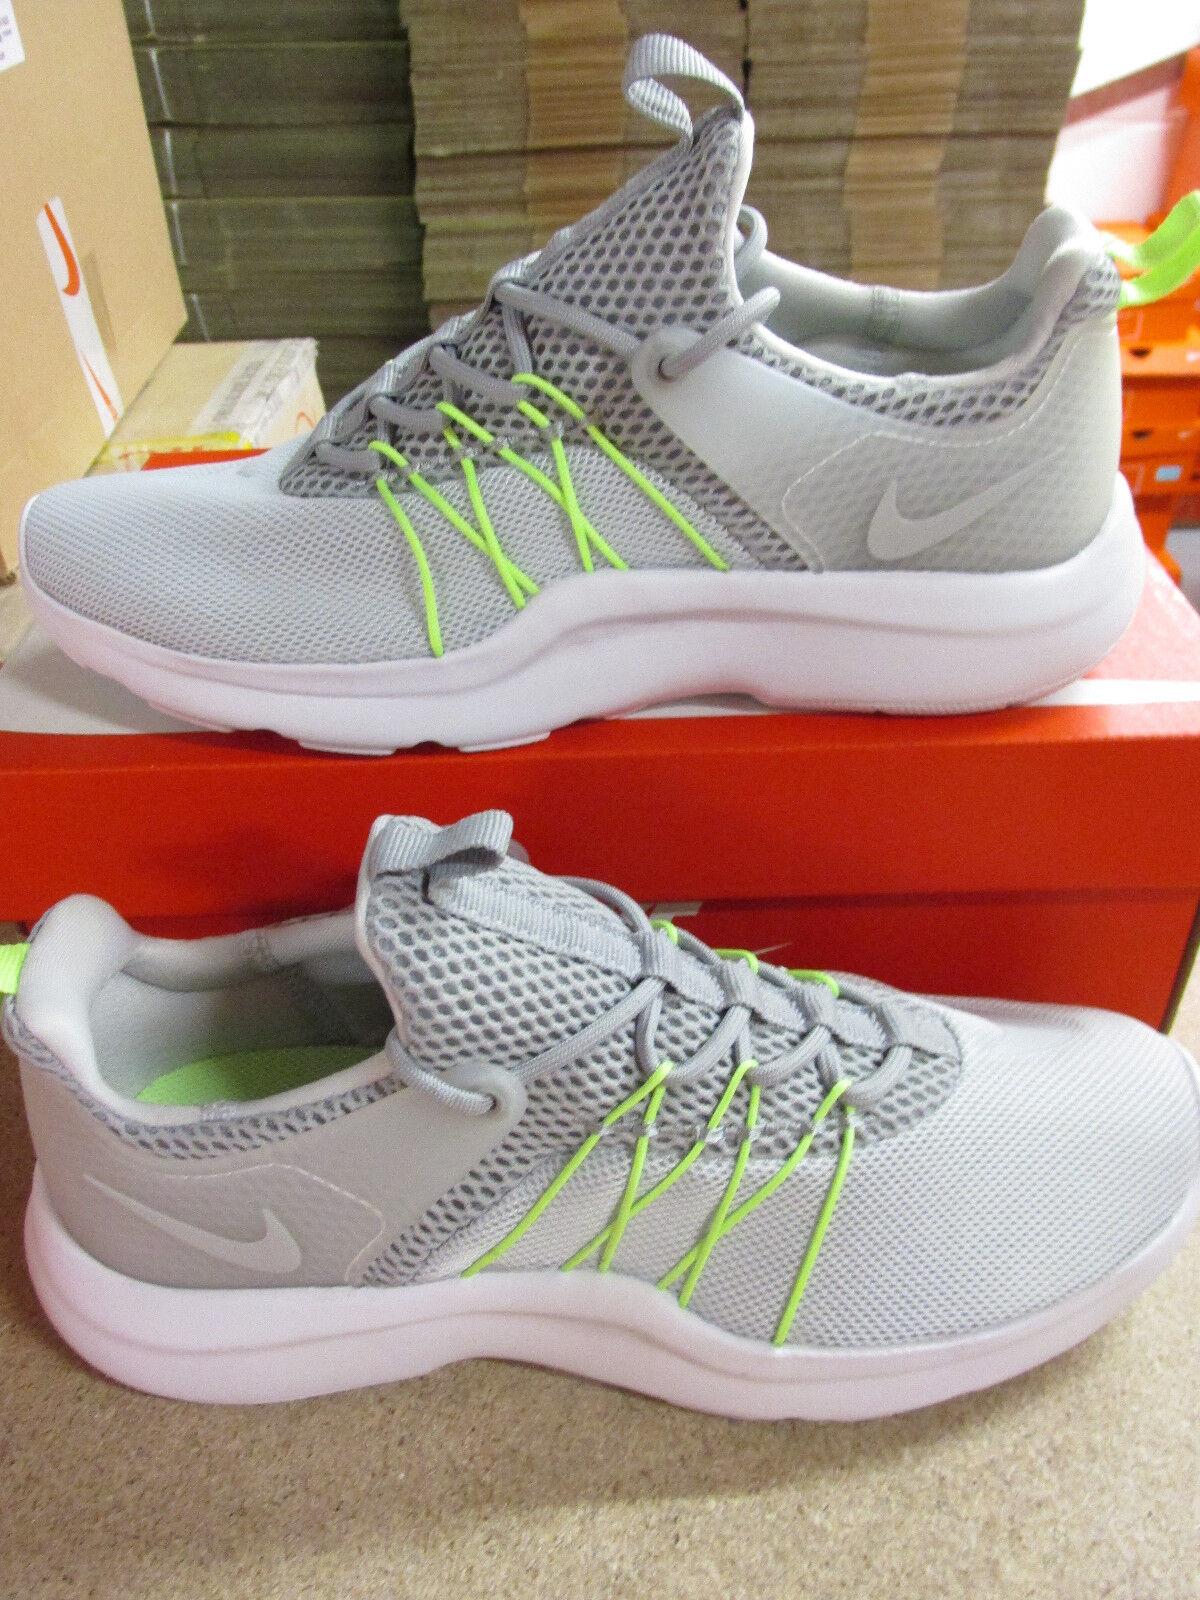 Nike Zapatillas Para Mujer Running Darwin 819959 001 Tenis Zapatos